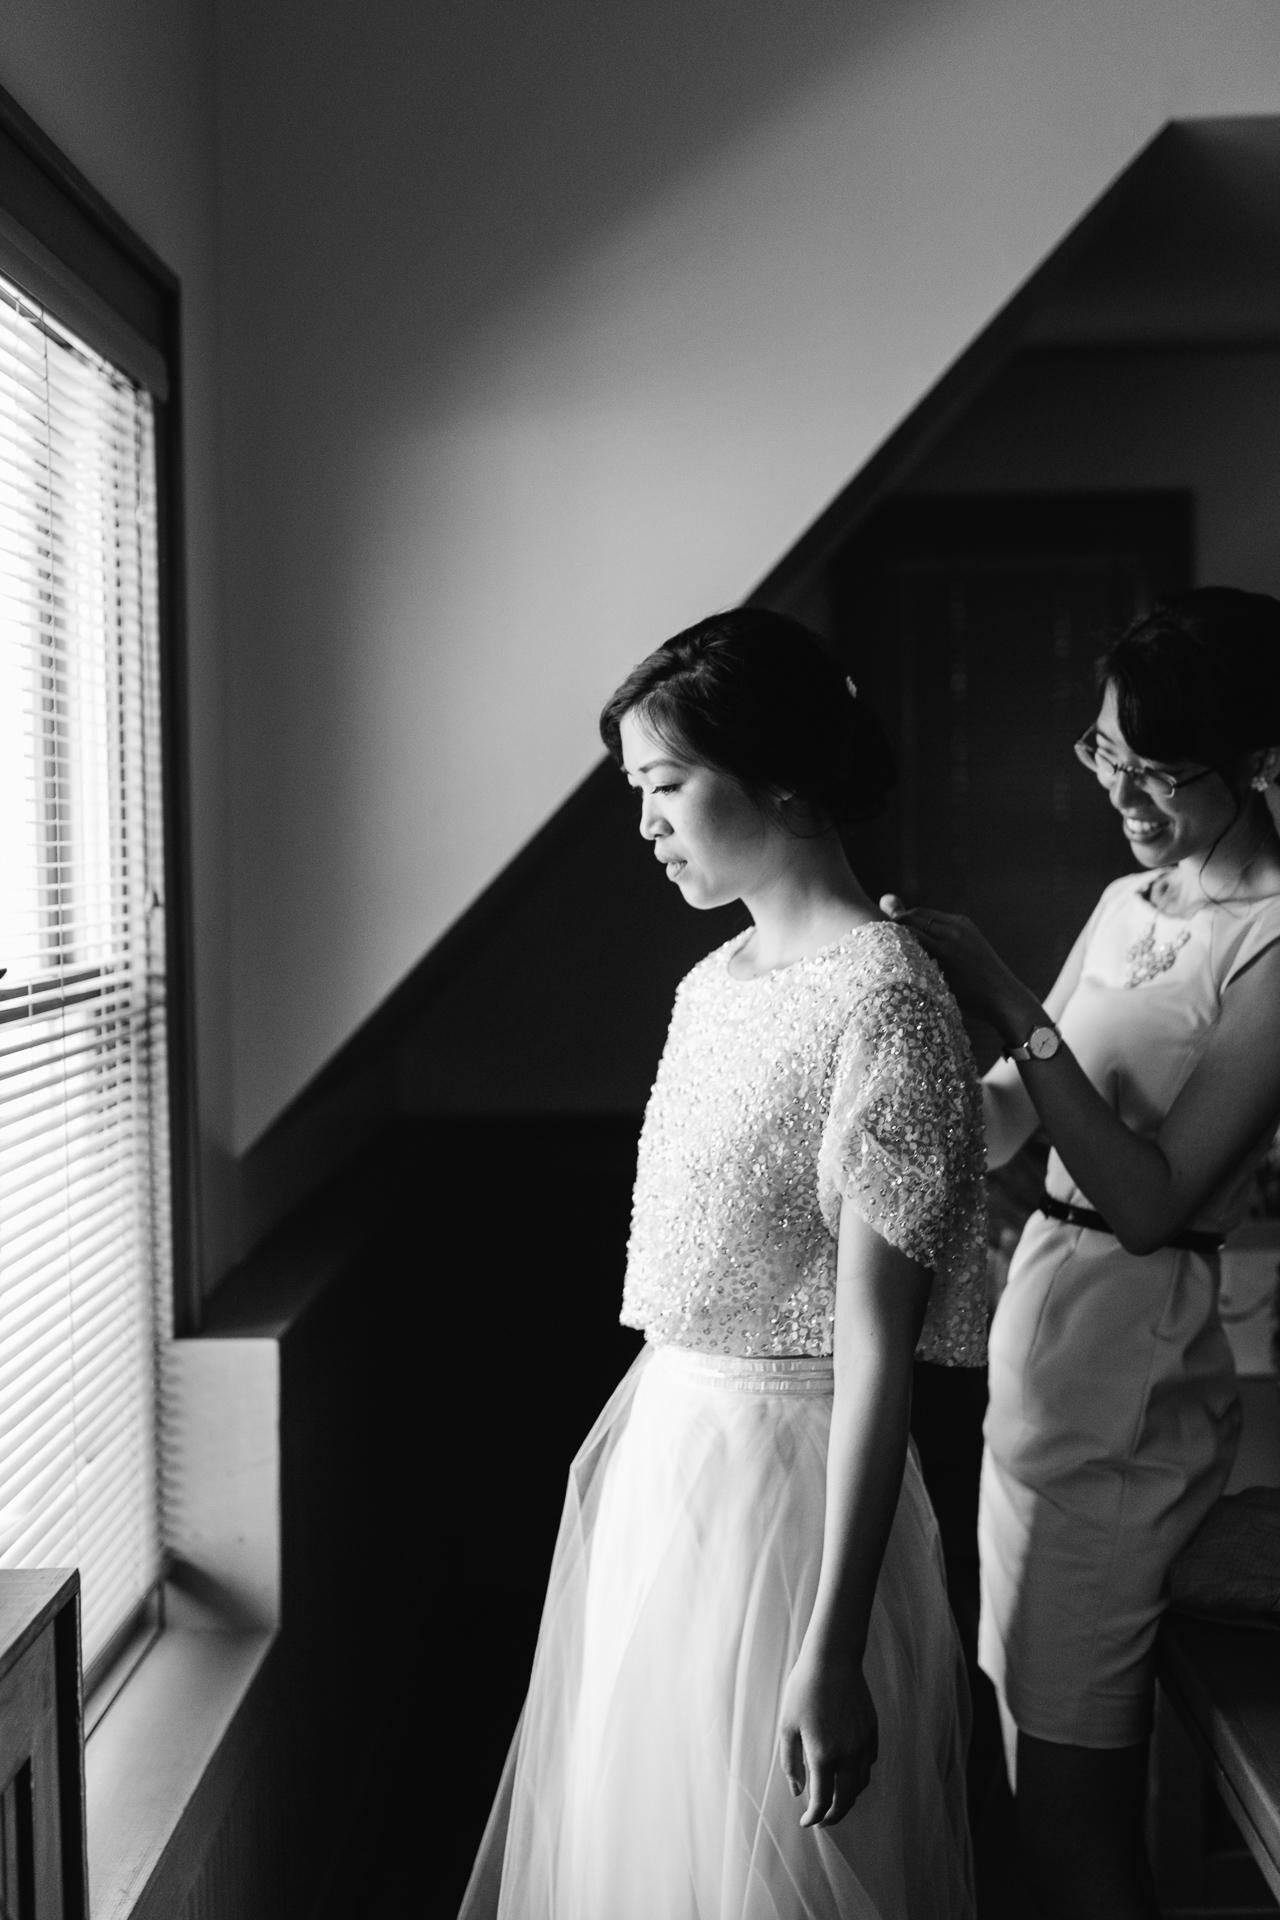 jess-hunter-seattle-artistic-wedding-photographer-3881.jpg